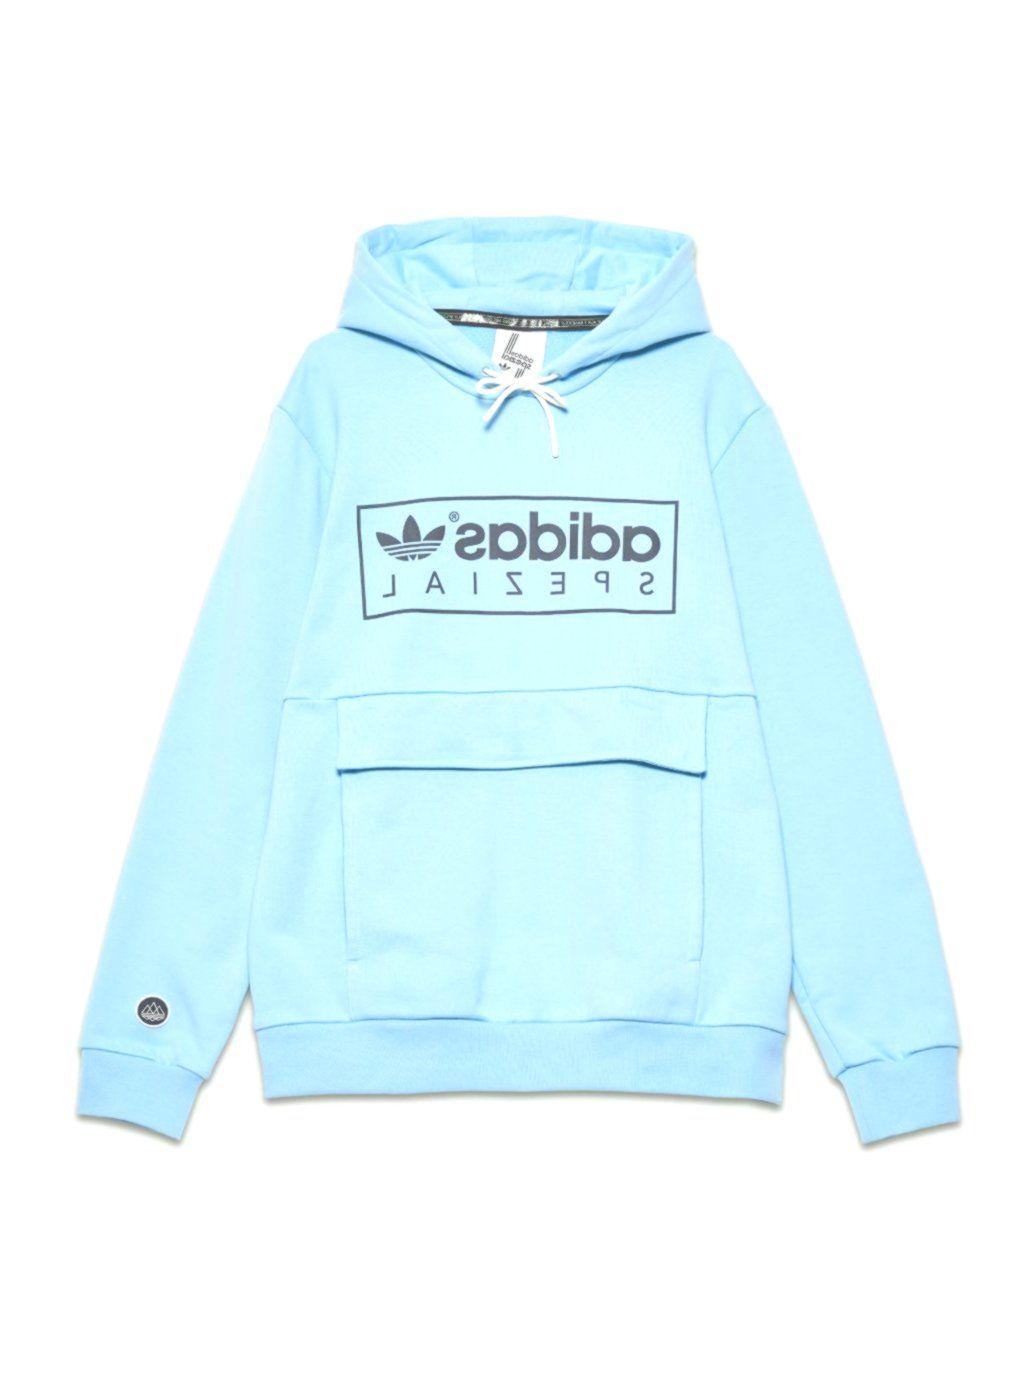 Womenshop Space Adidas Spezial Hooded Sweatshirts Sweatshirts [ 1380 x 1035 Pixel ]